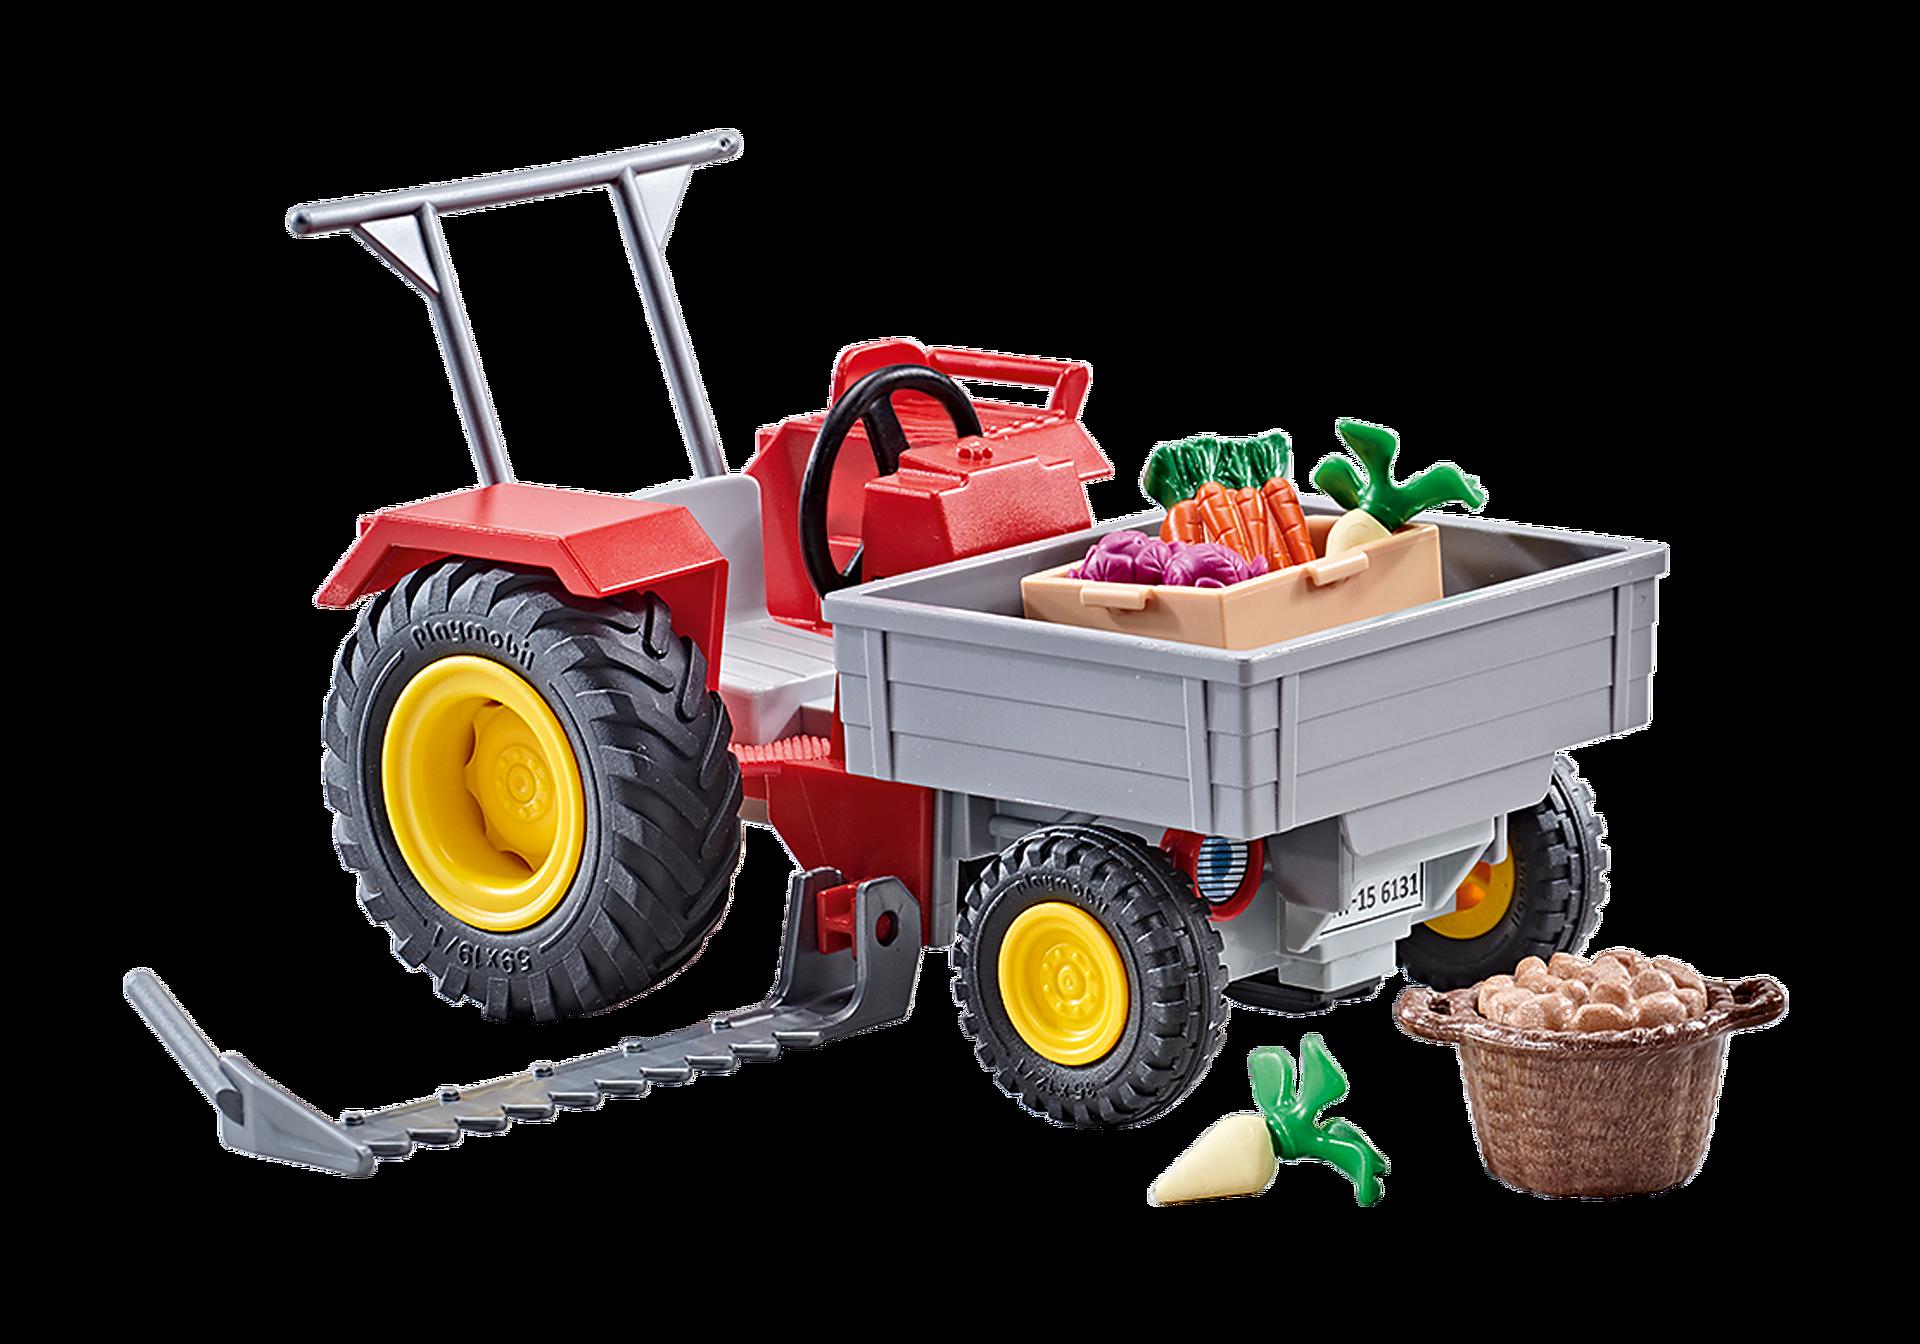 9831 Tractor con Segadora Lateral zoom image1